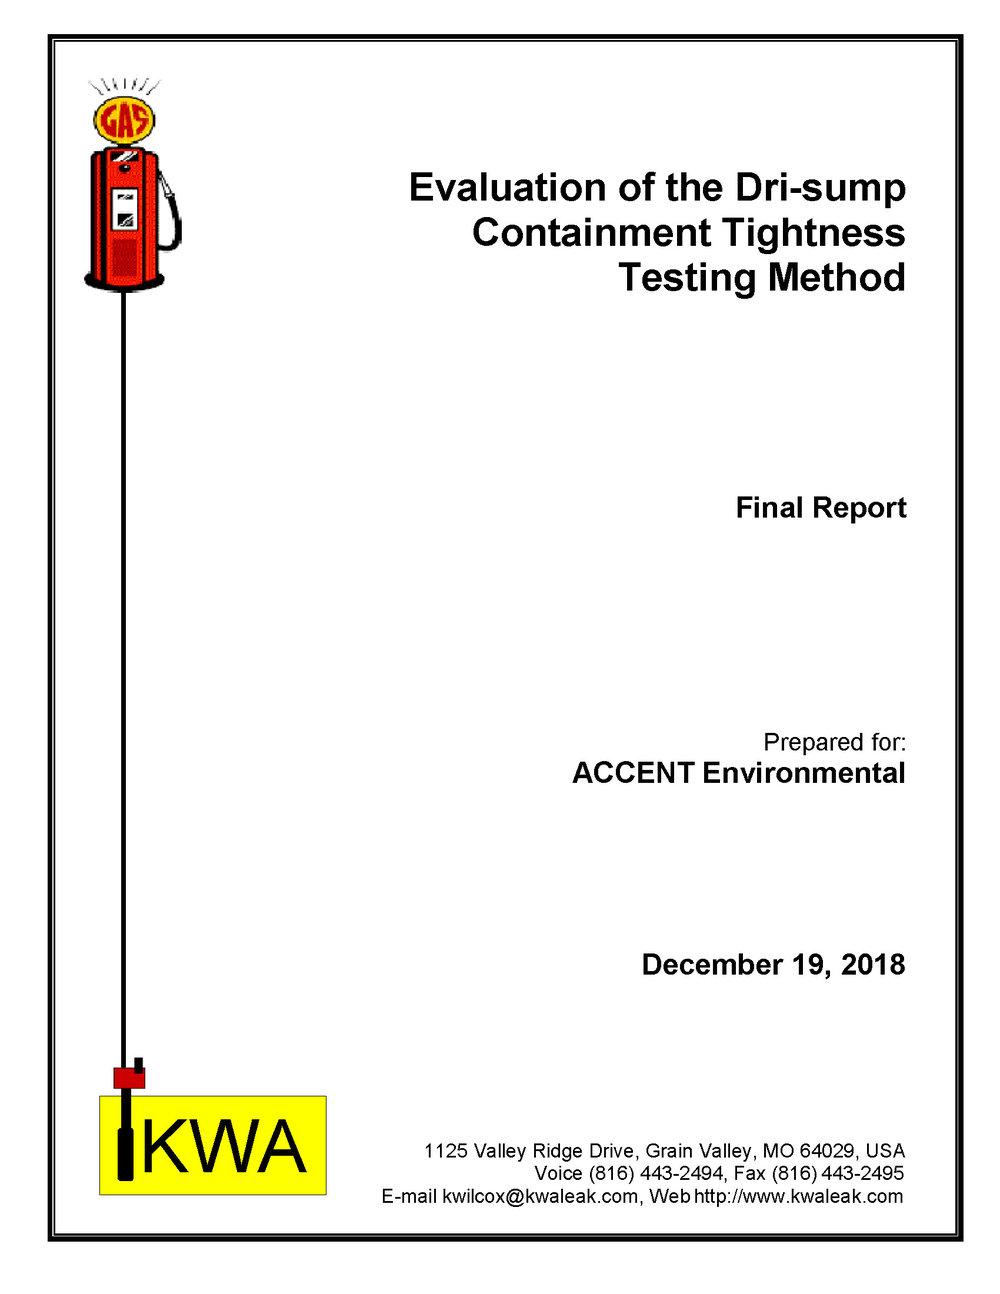 KWA Final Report Dri Sump 12 19 2018_Page_01.jpg